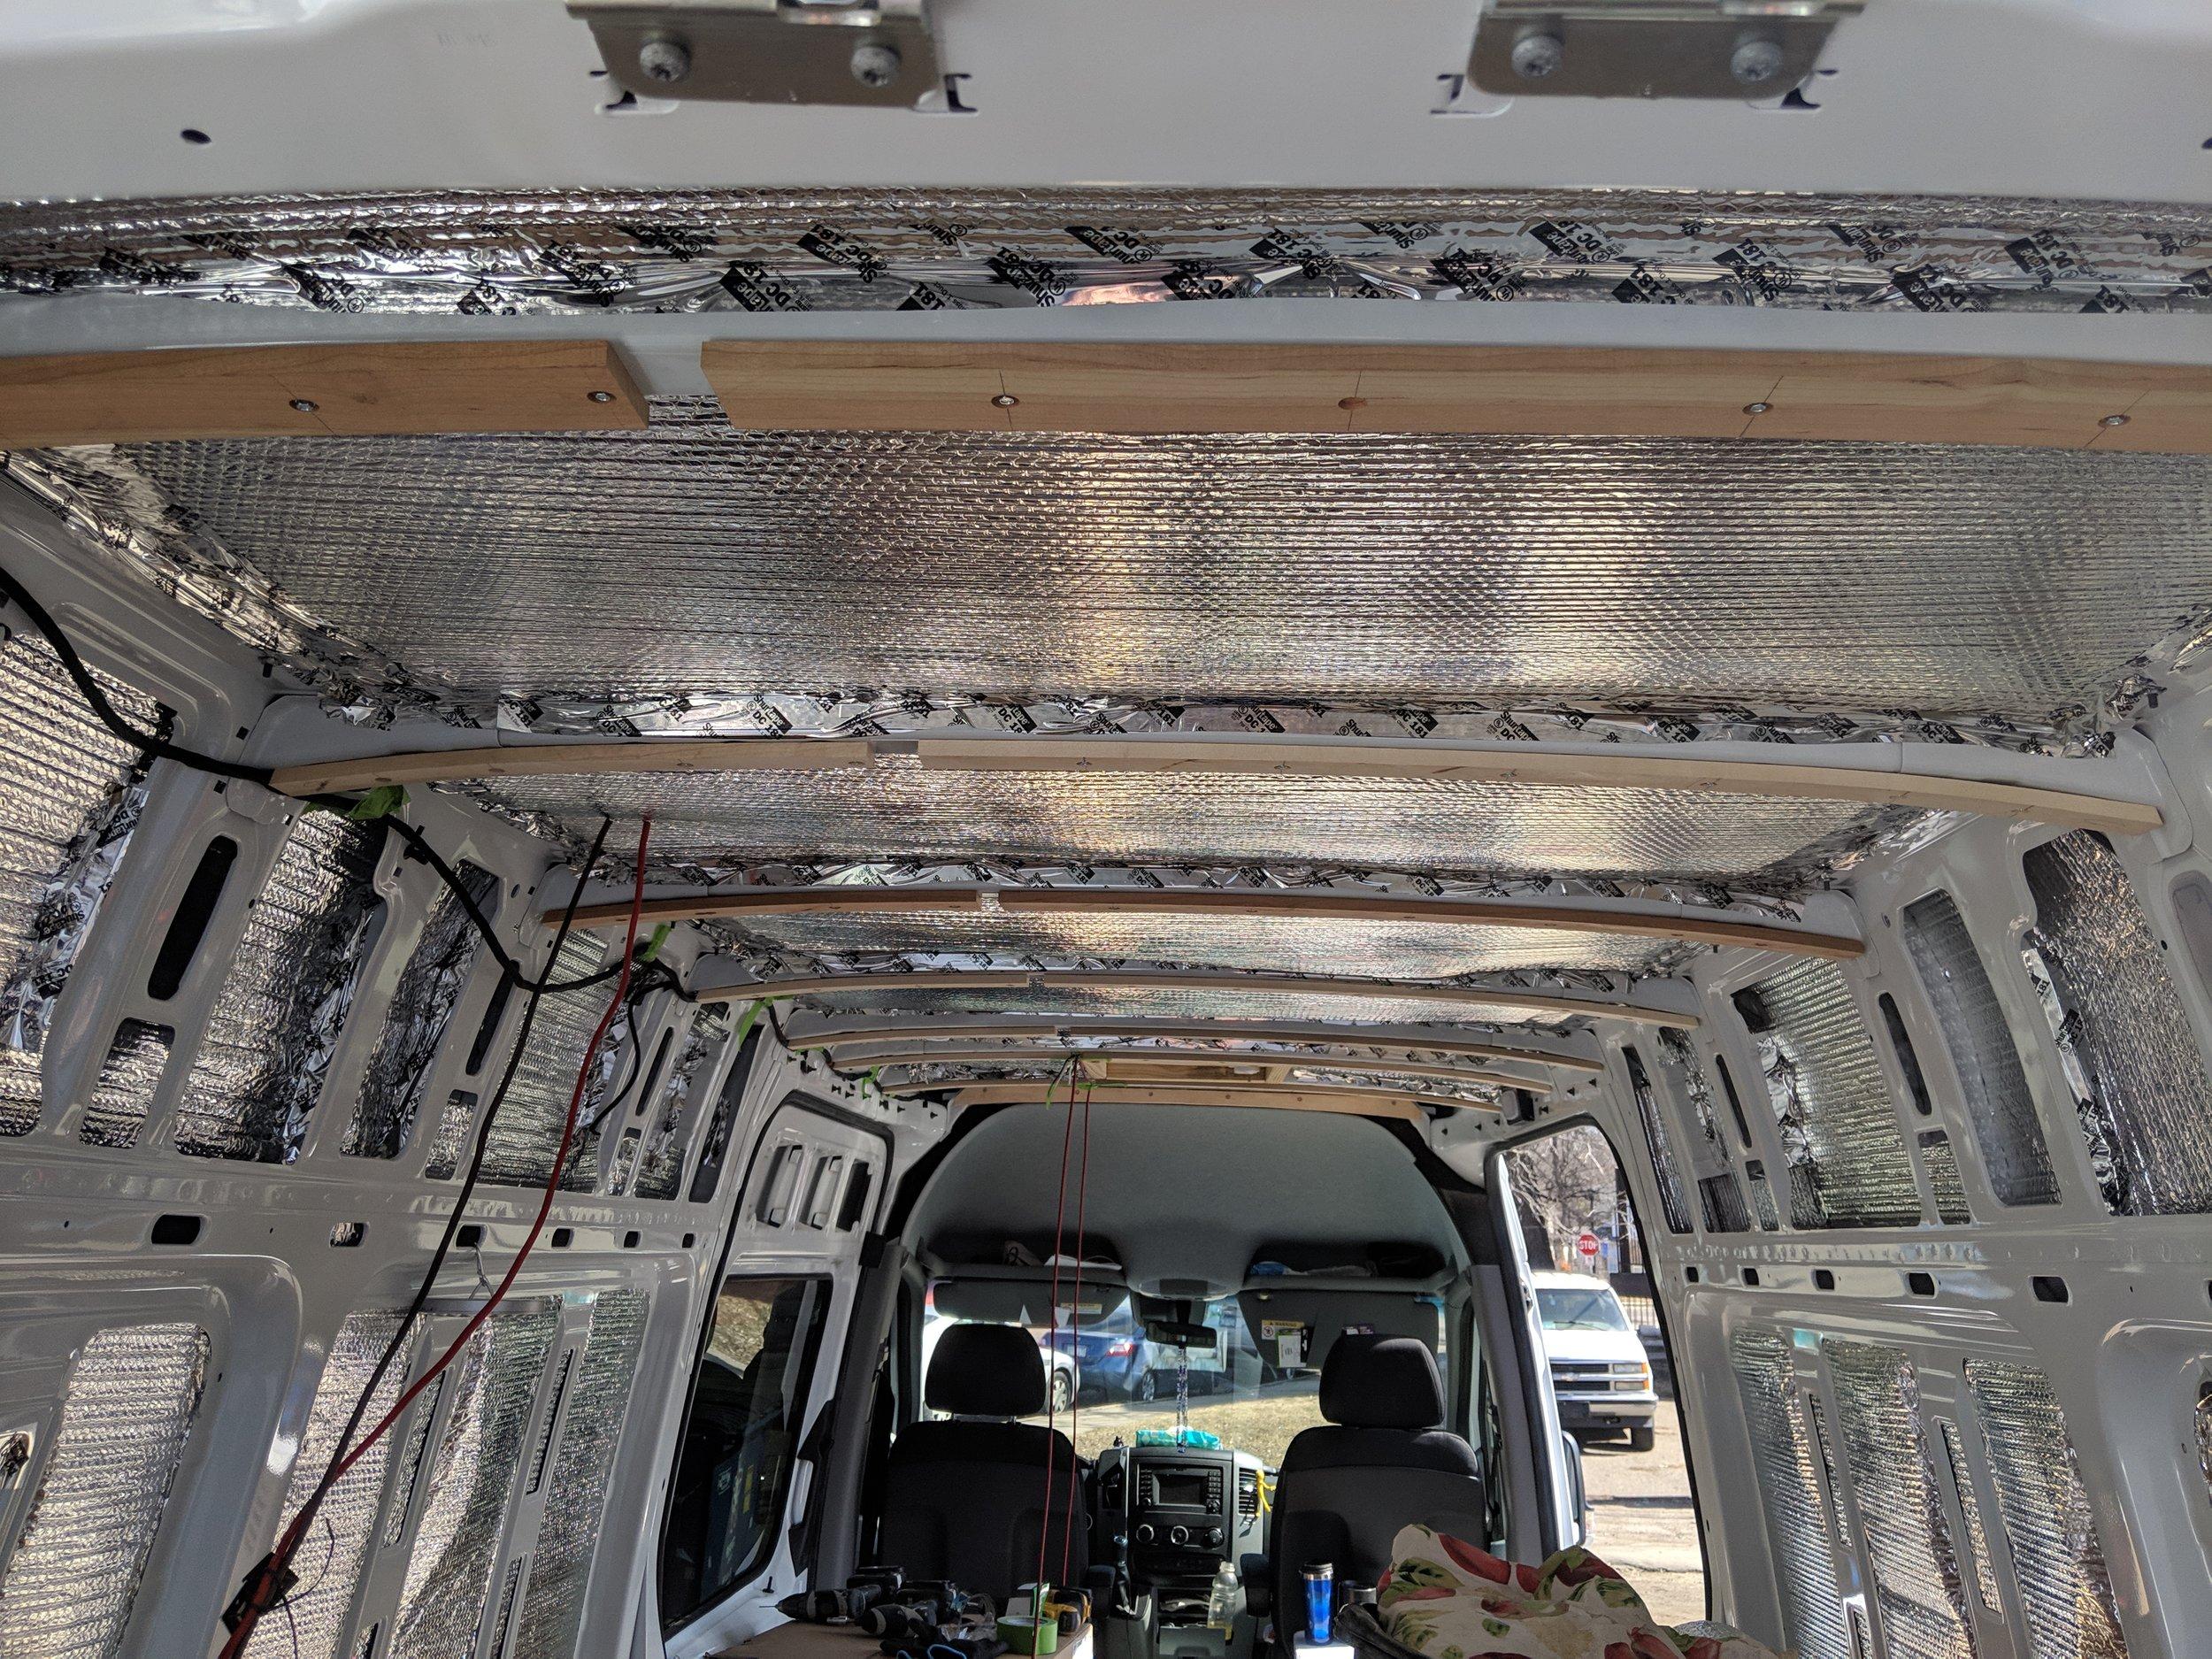 Installing ceiling furring strips